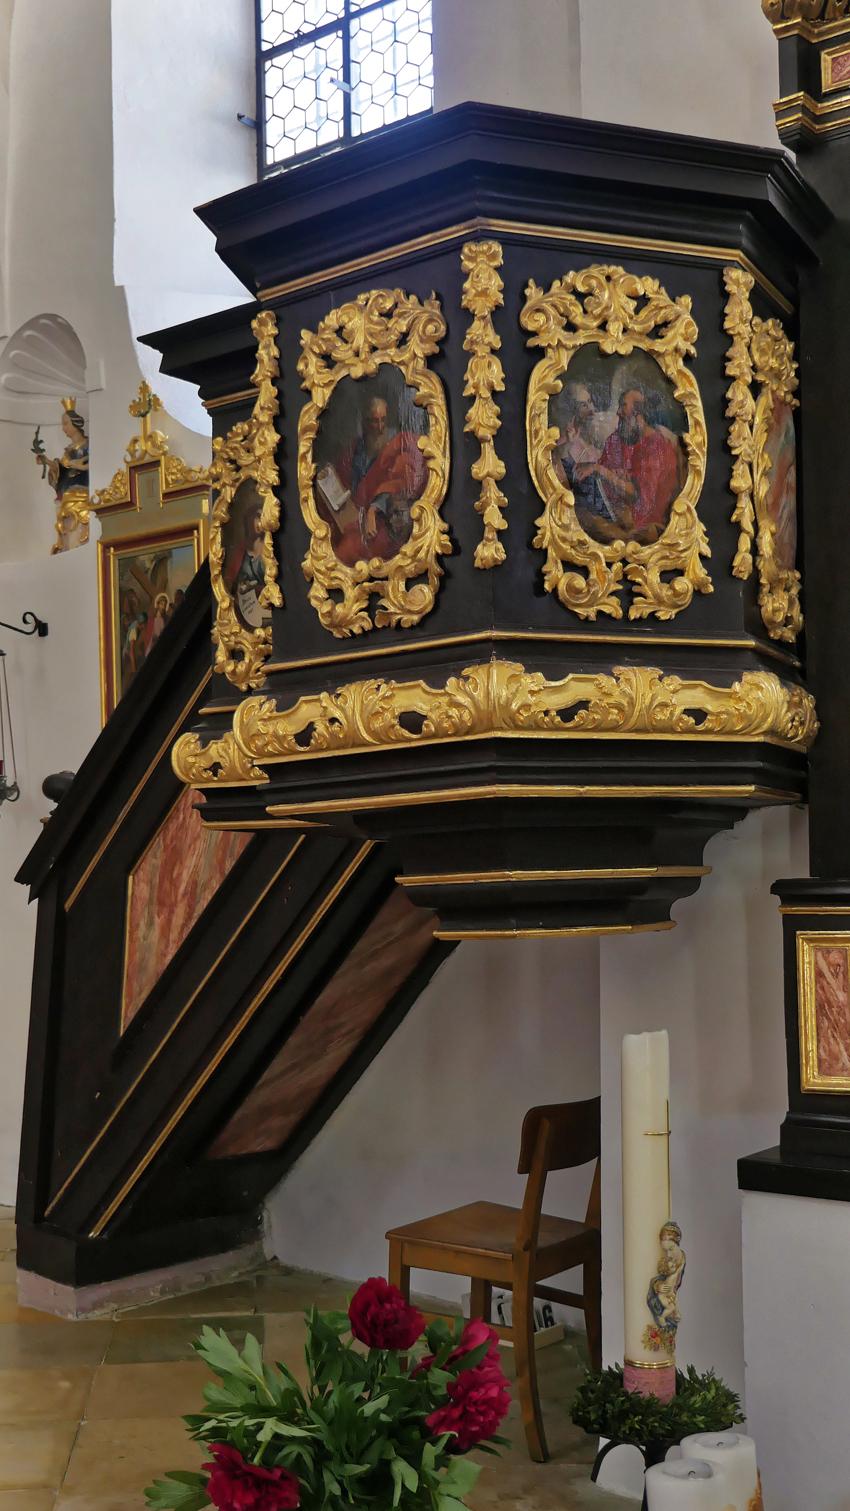 2021 04 26 aoelfb wallfahrtskirche mariae himmelfahrt atzberg15